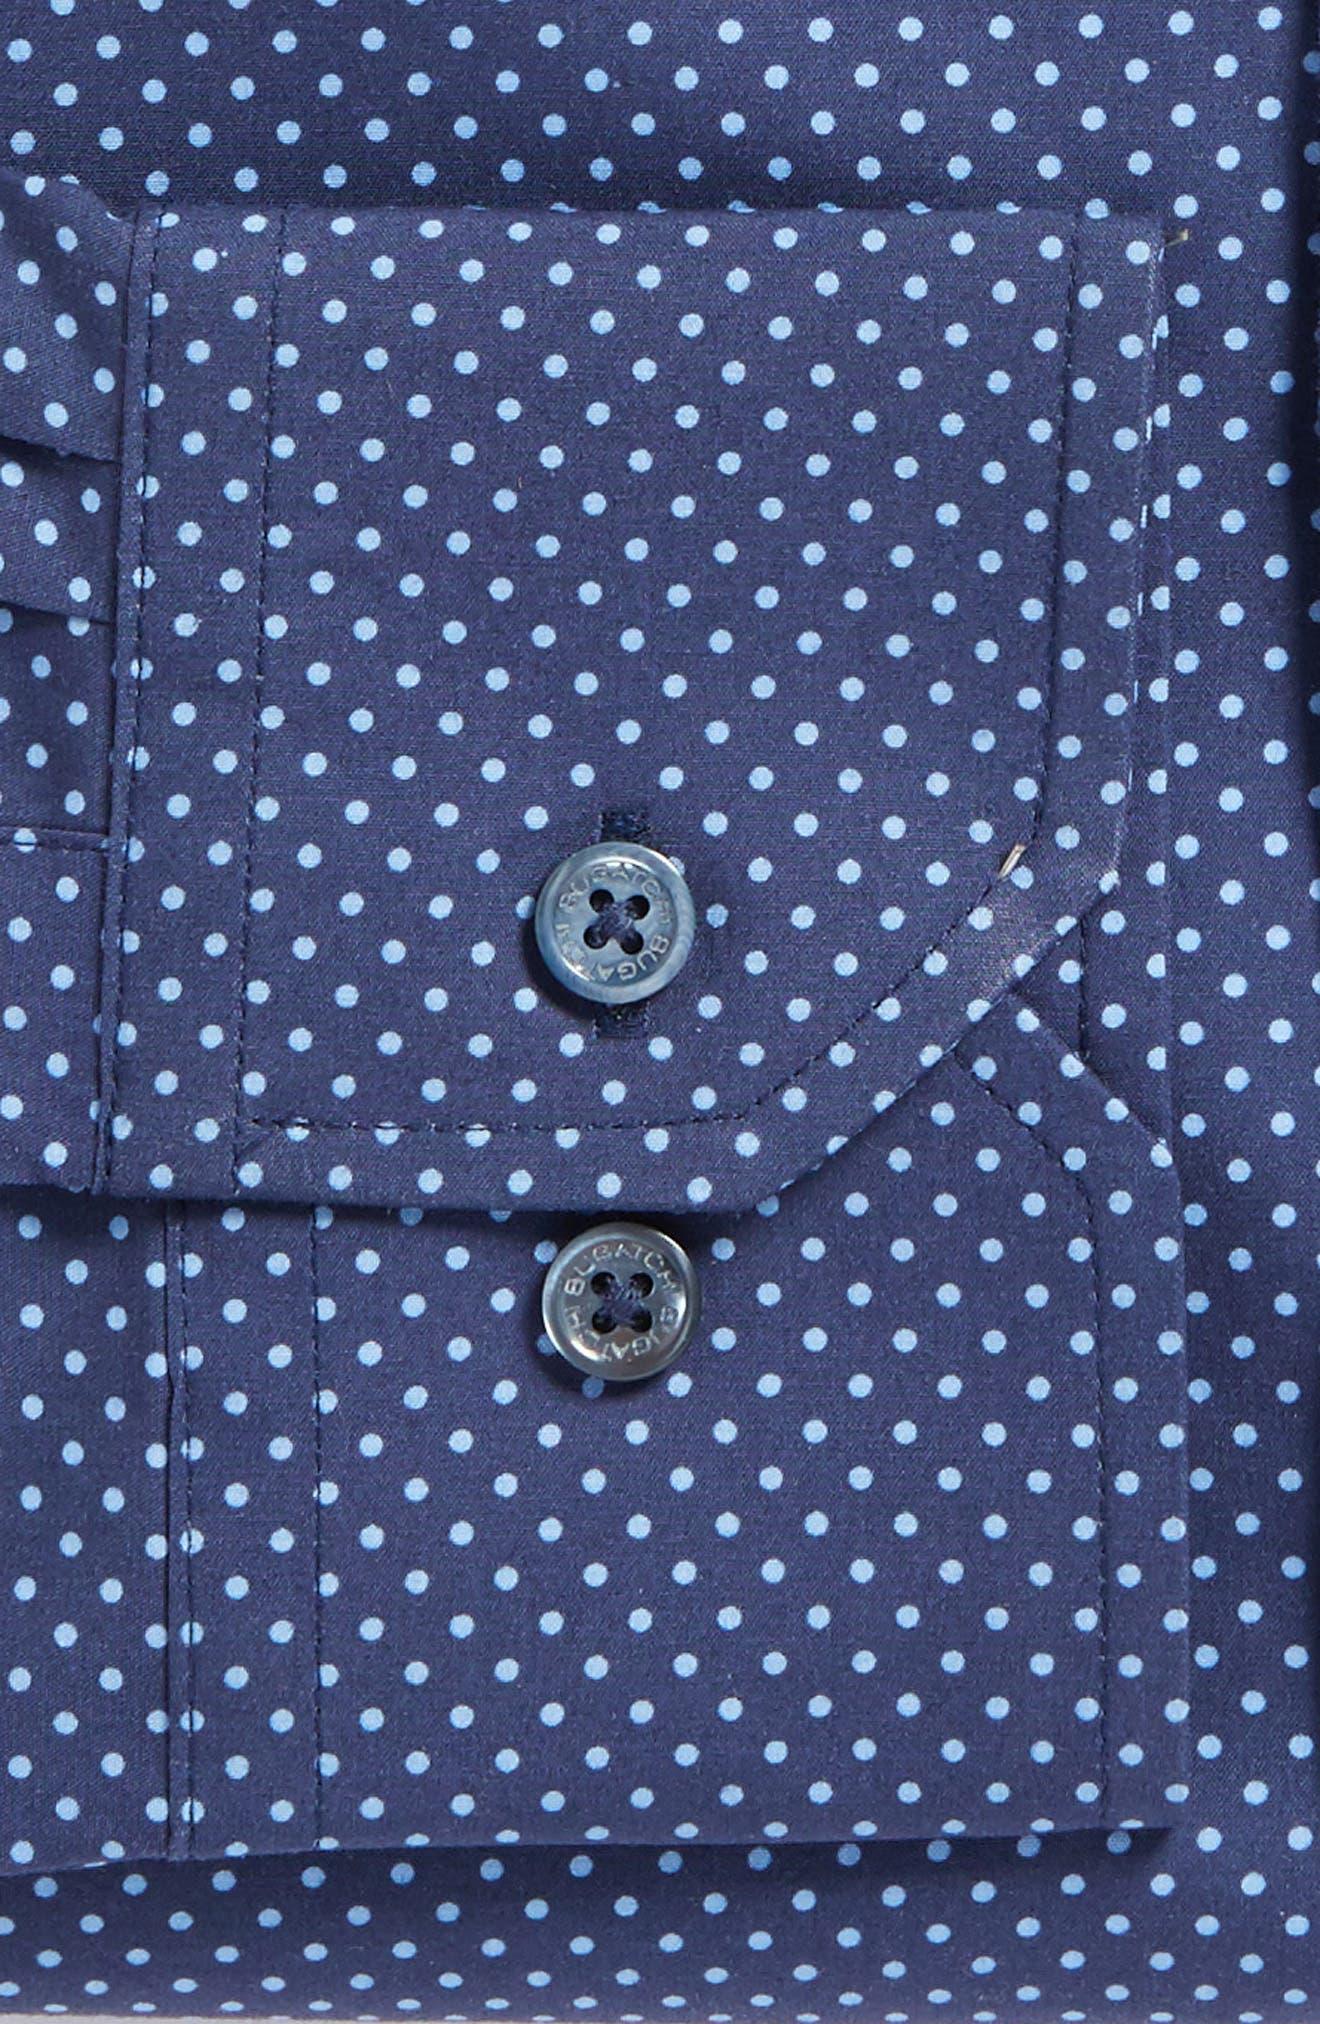 Trim Fit Dot Dress Shirt,                             Alternate thumbnail 2, color,                             Midnight